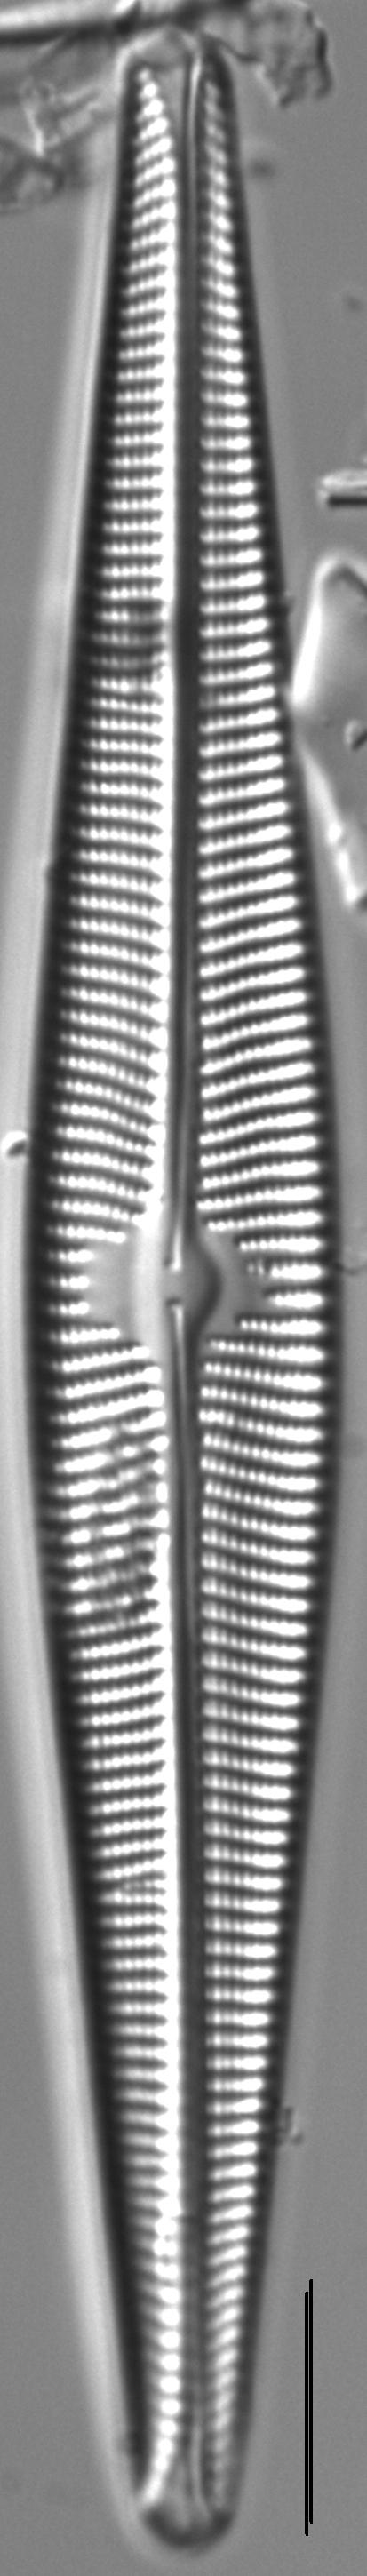 Navicula galloae LM3